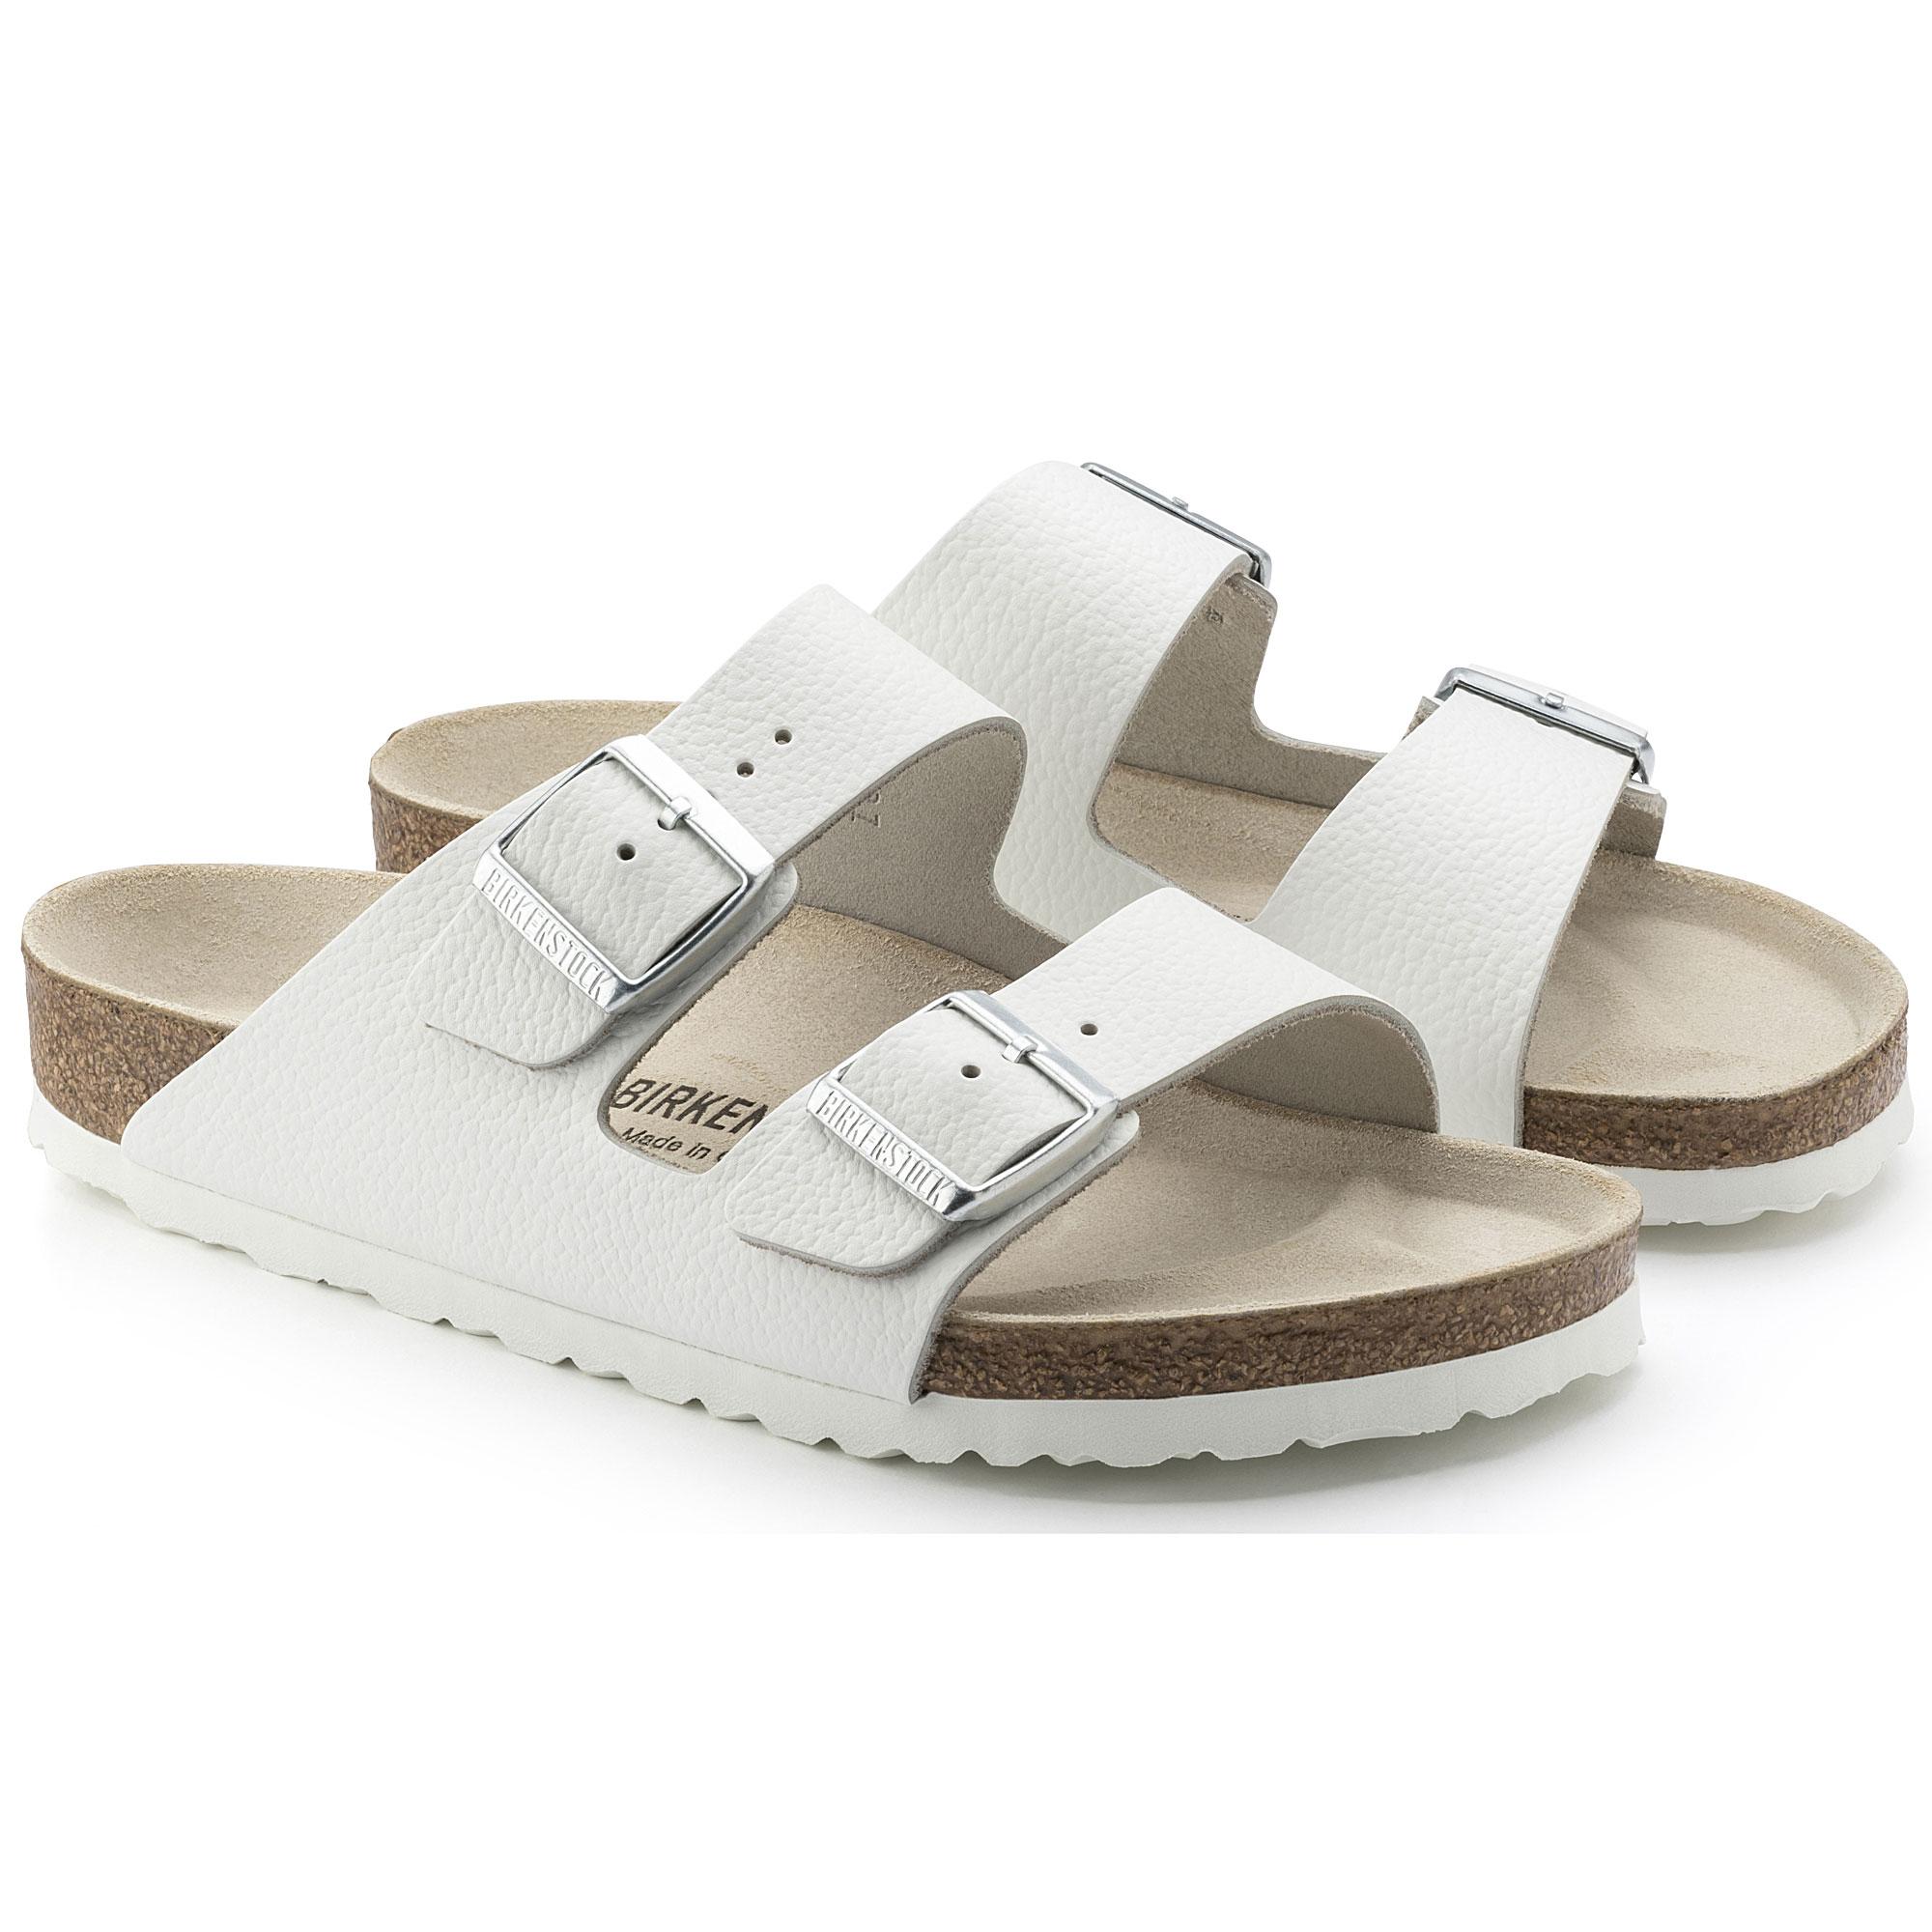 0fd8791c0905 Arizona Nubuck Leather White | shop online at BIRKENSTOCK